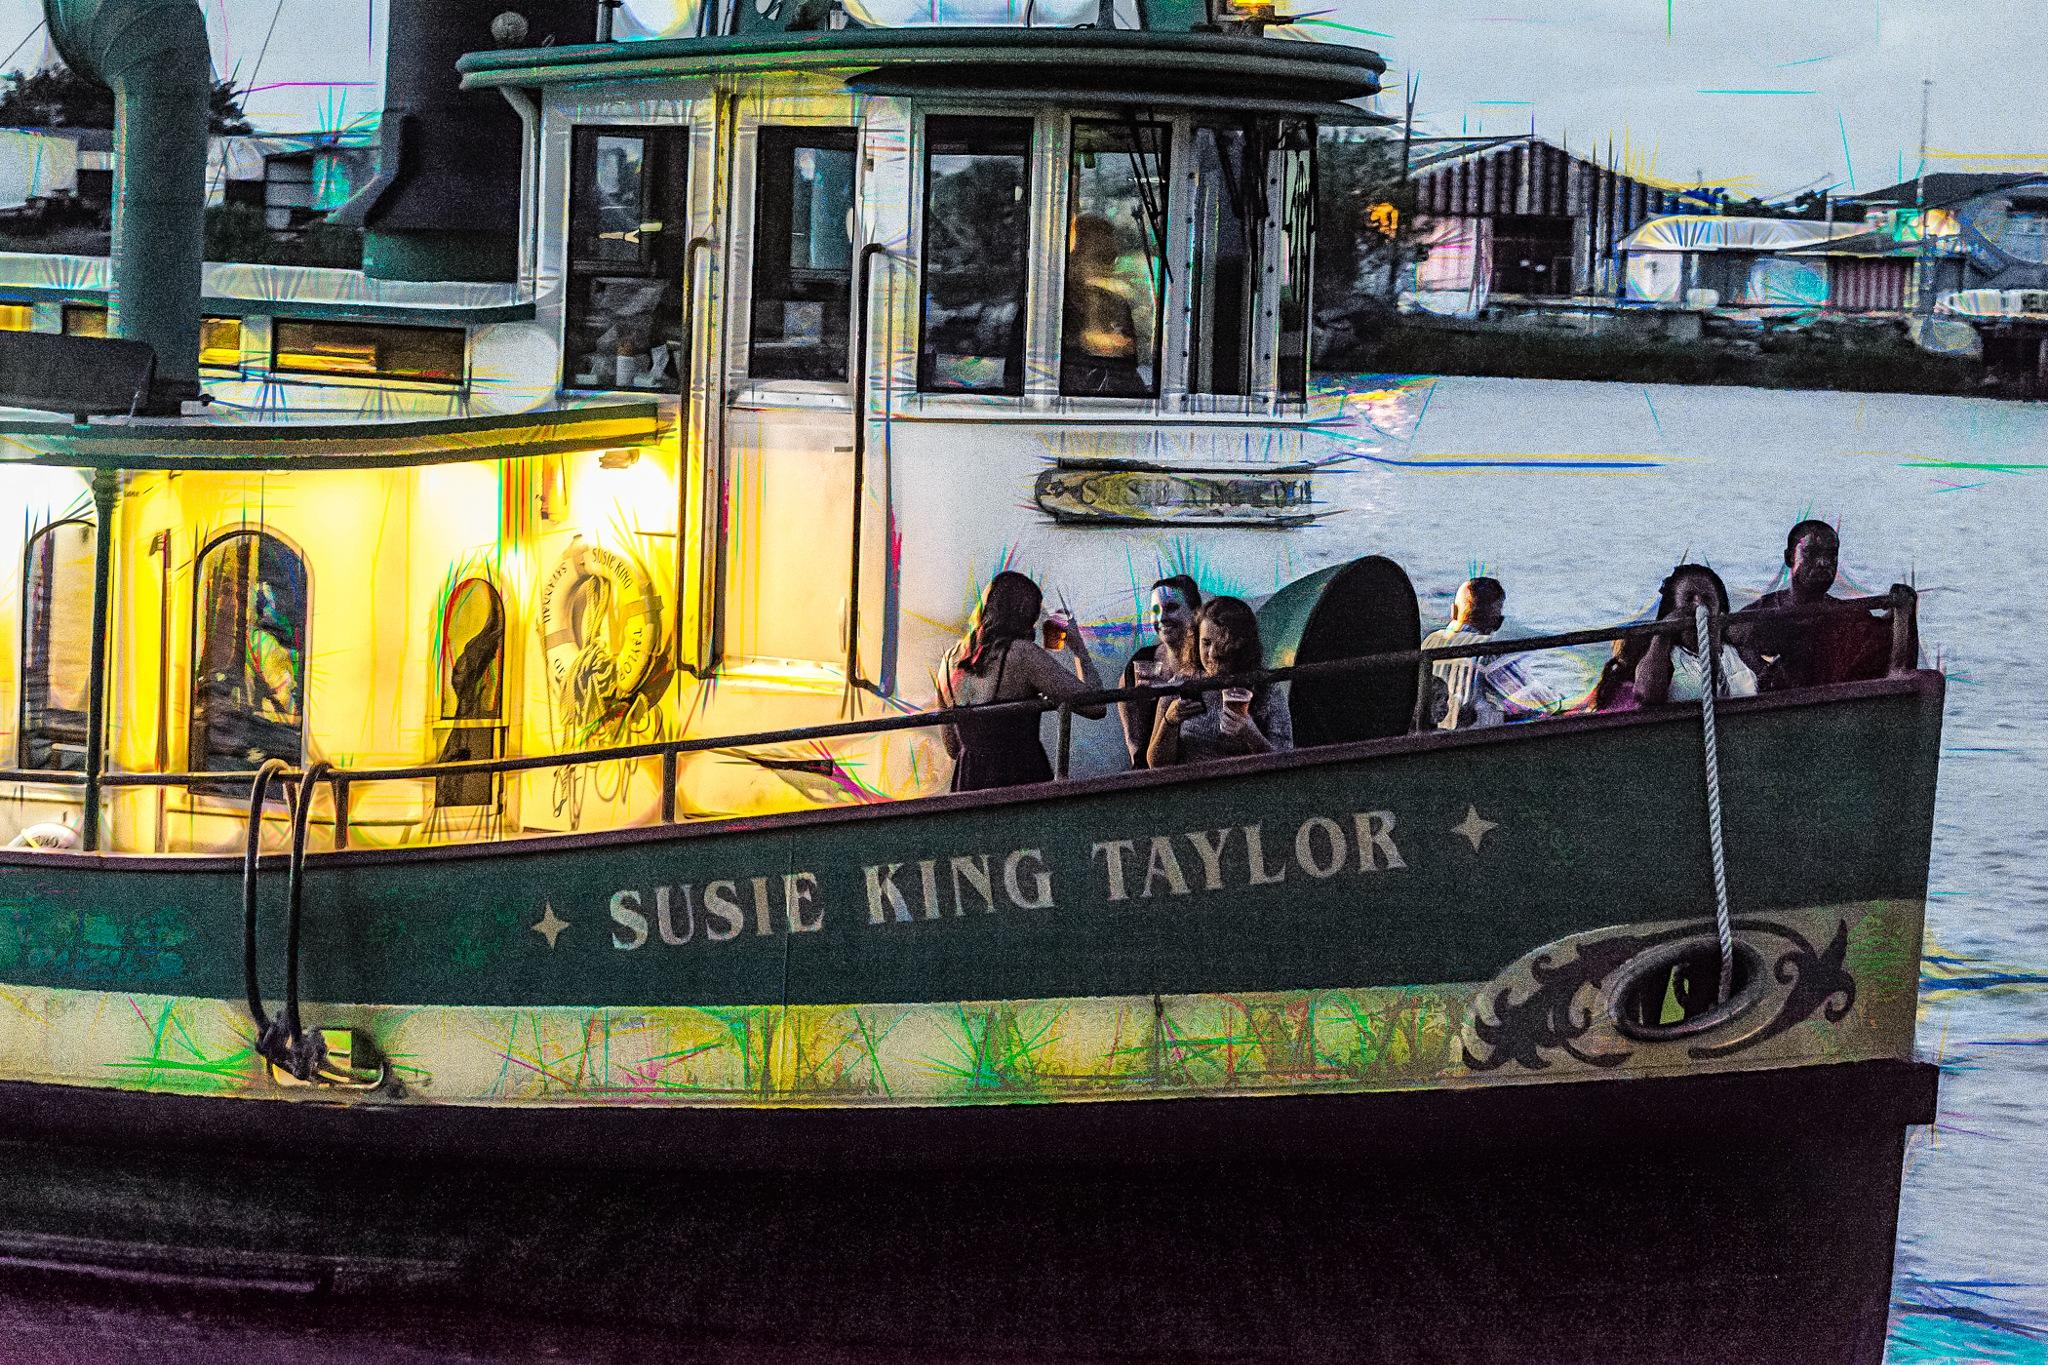 night cruise by wacissa